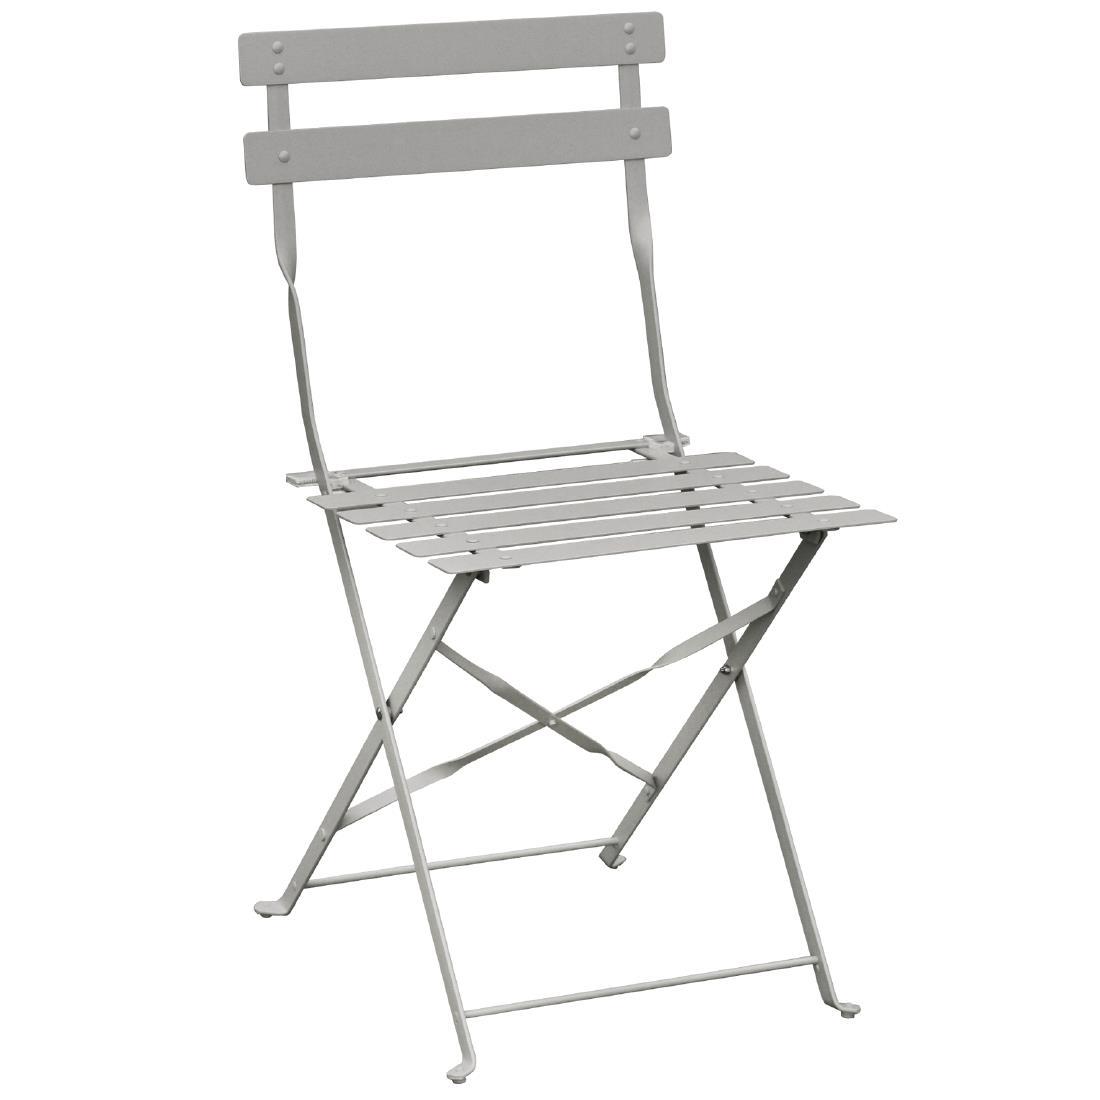 Steel Folding Chair - Grey